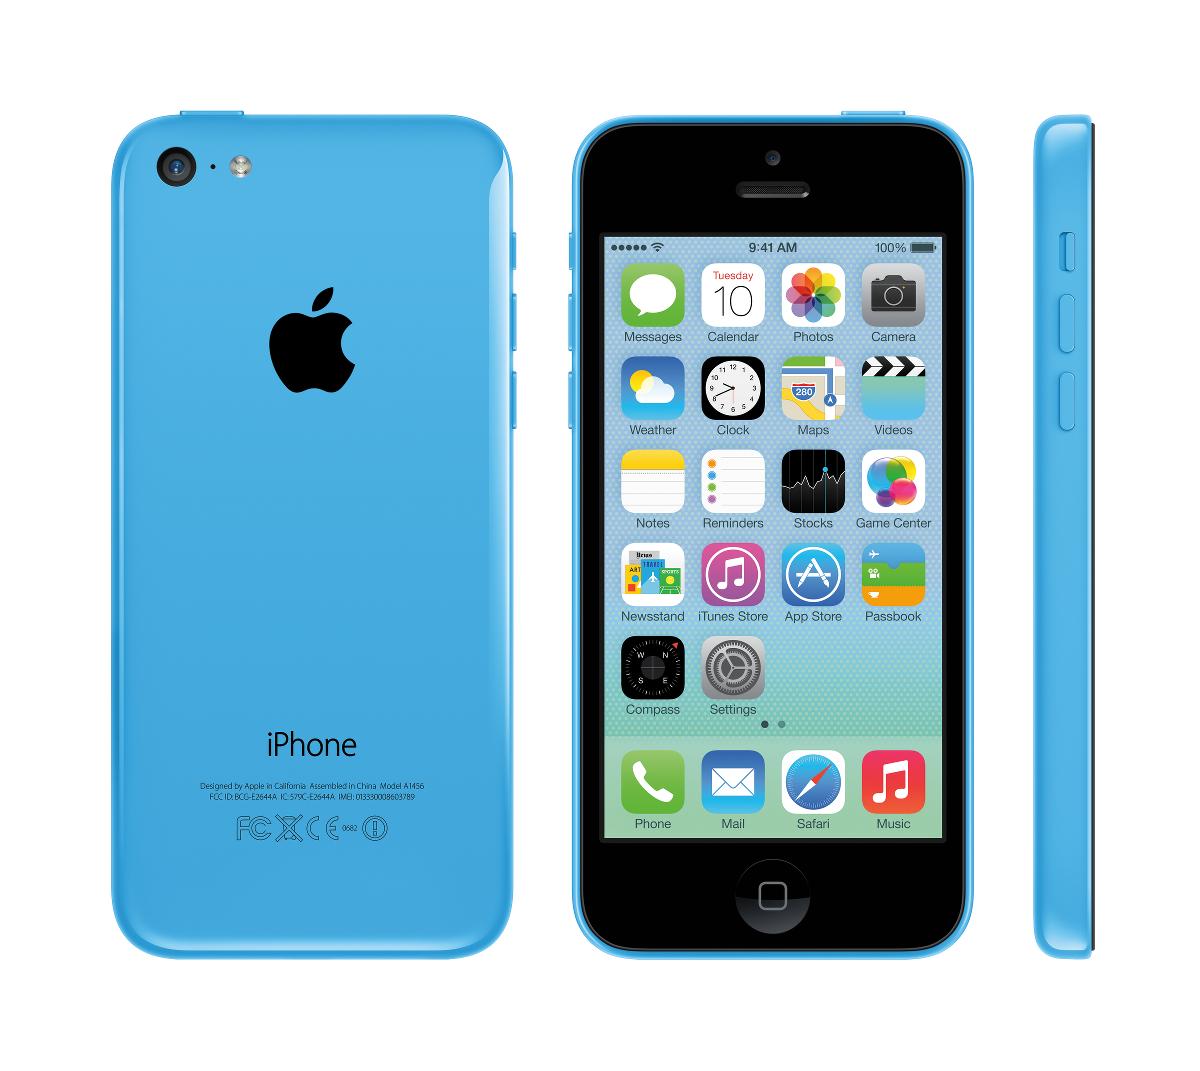 Apple Iphone 5c External Reviews 5 Certified Pre Owned 32gb